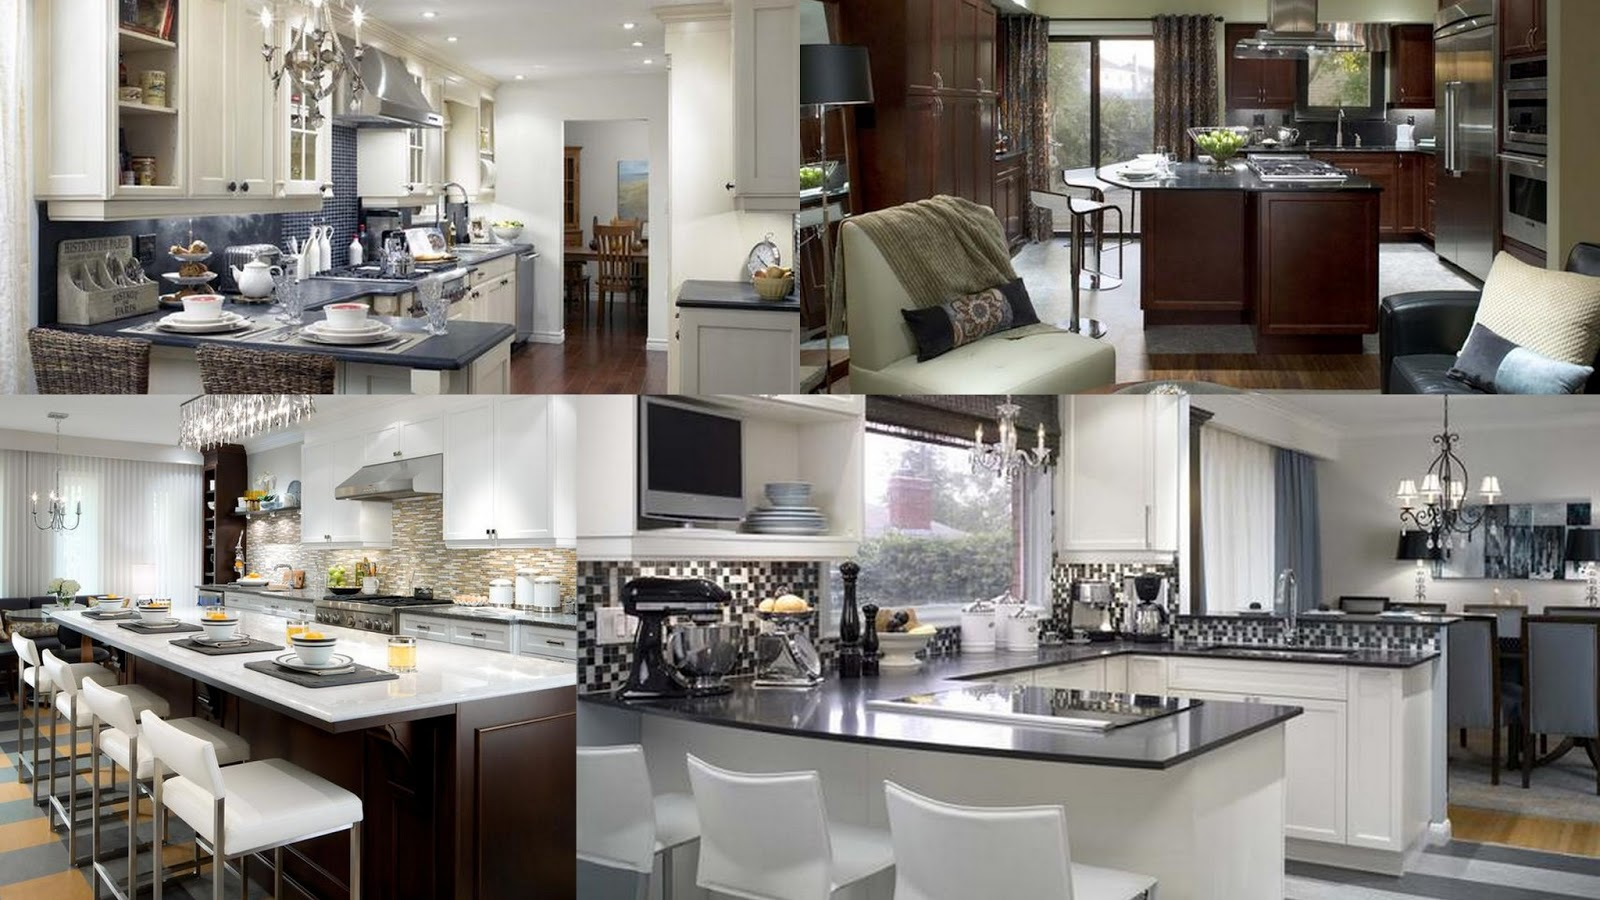 candice olson gray kitchen photo - 5